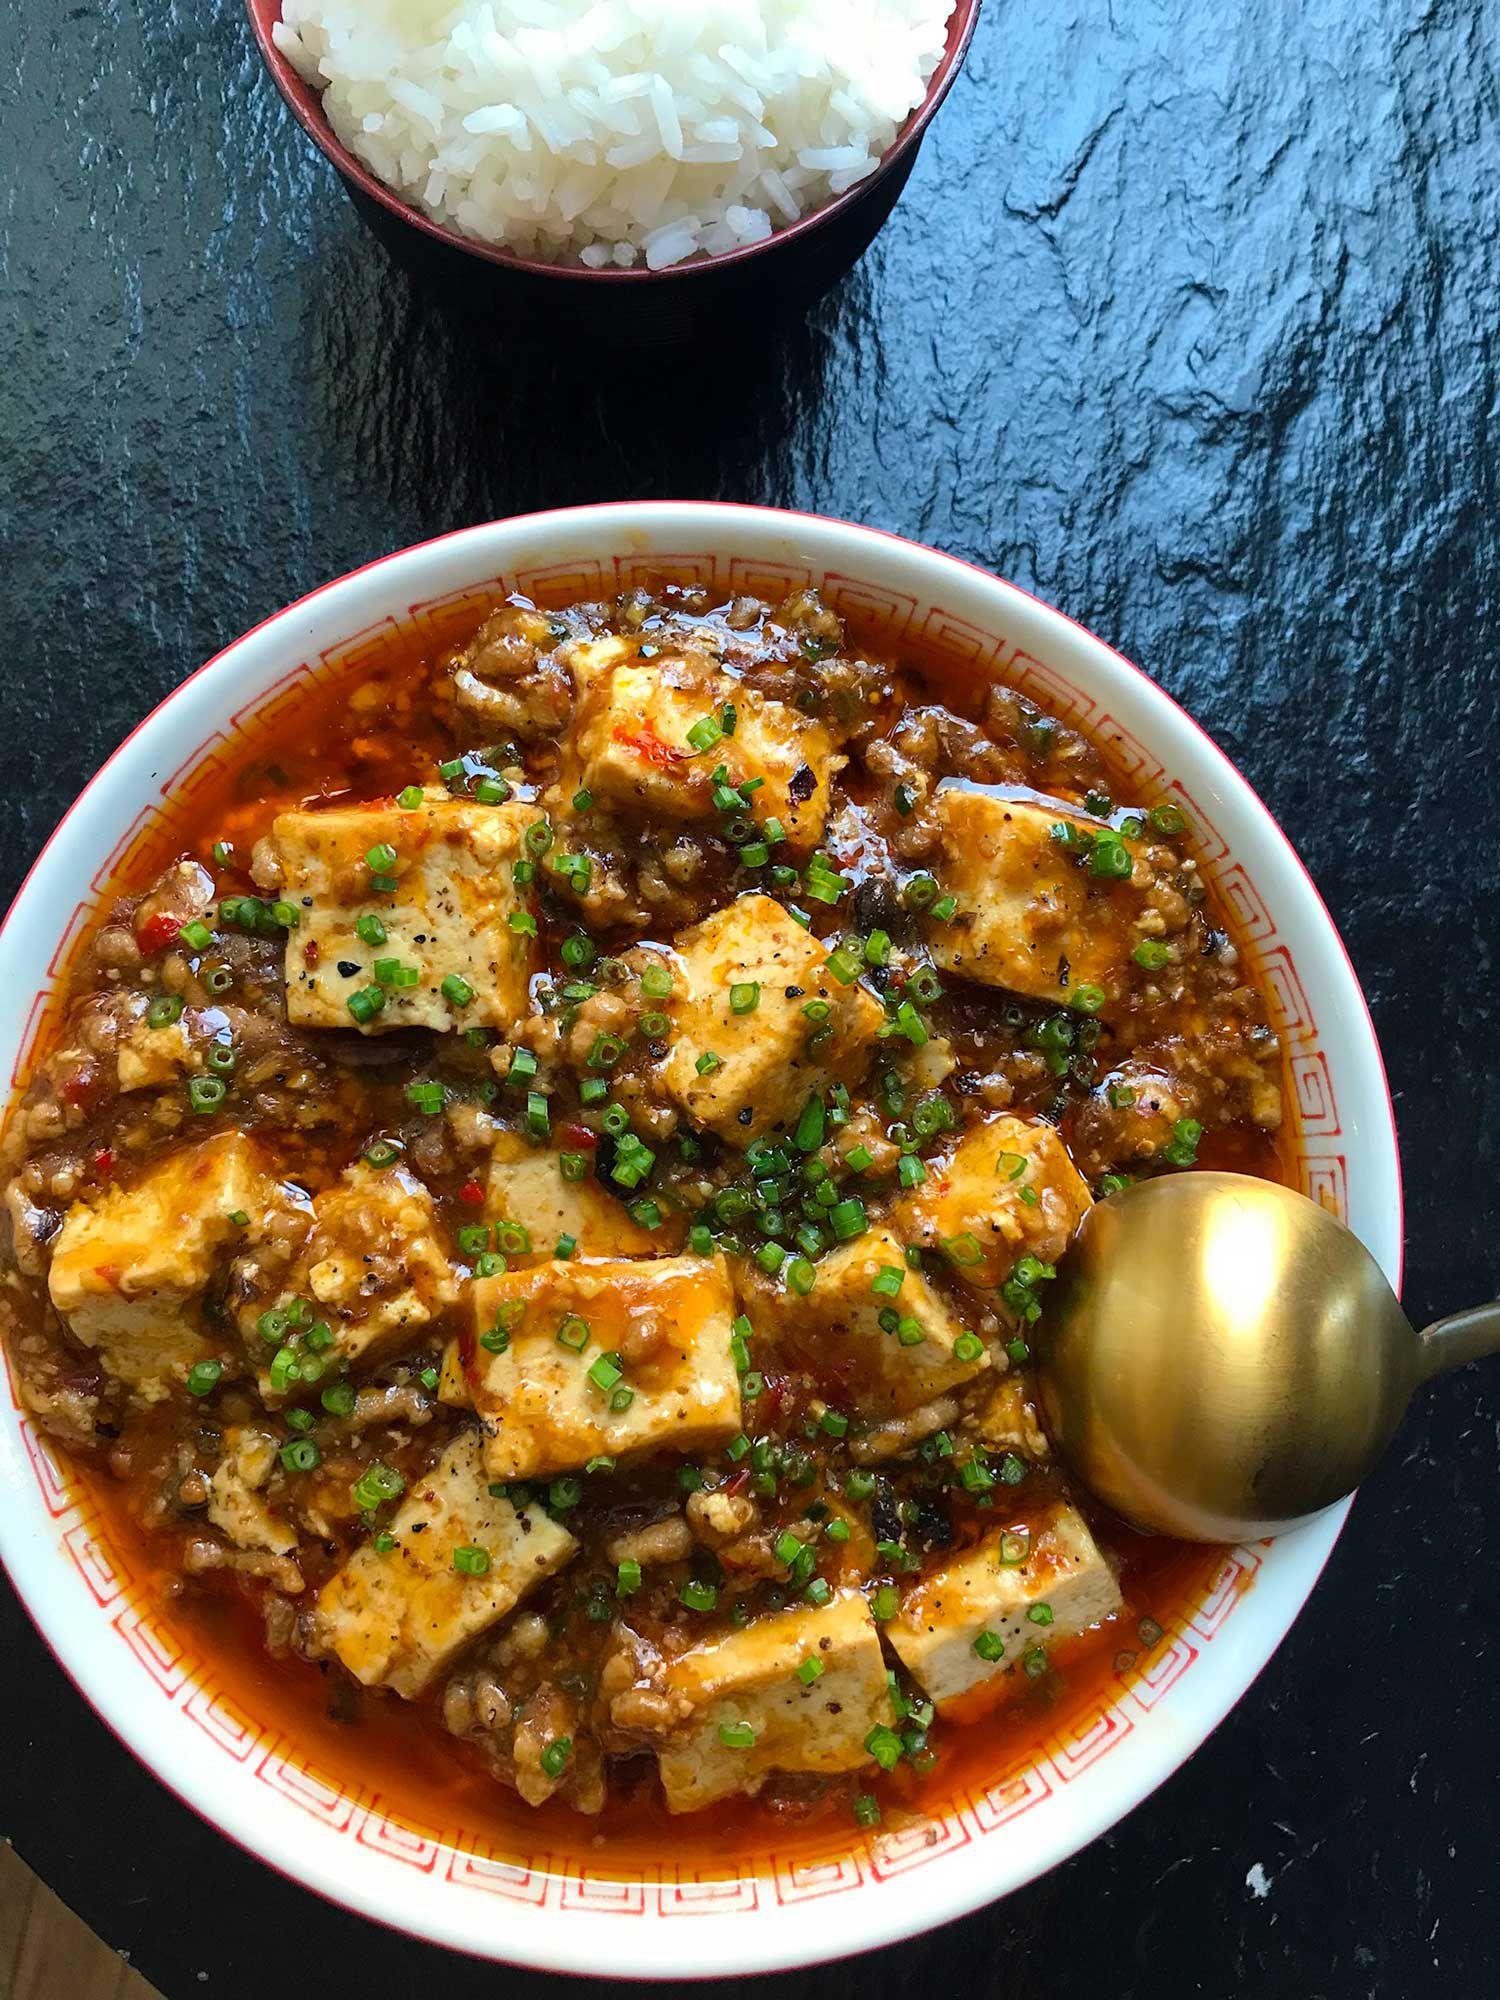 "<a href=""https://www.saveur.com/article/Recipes/Mapo-Tofu/"">Get the recipe for Mapo Tofu »</a>"